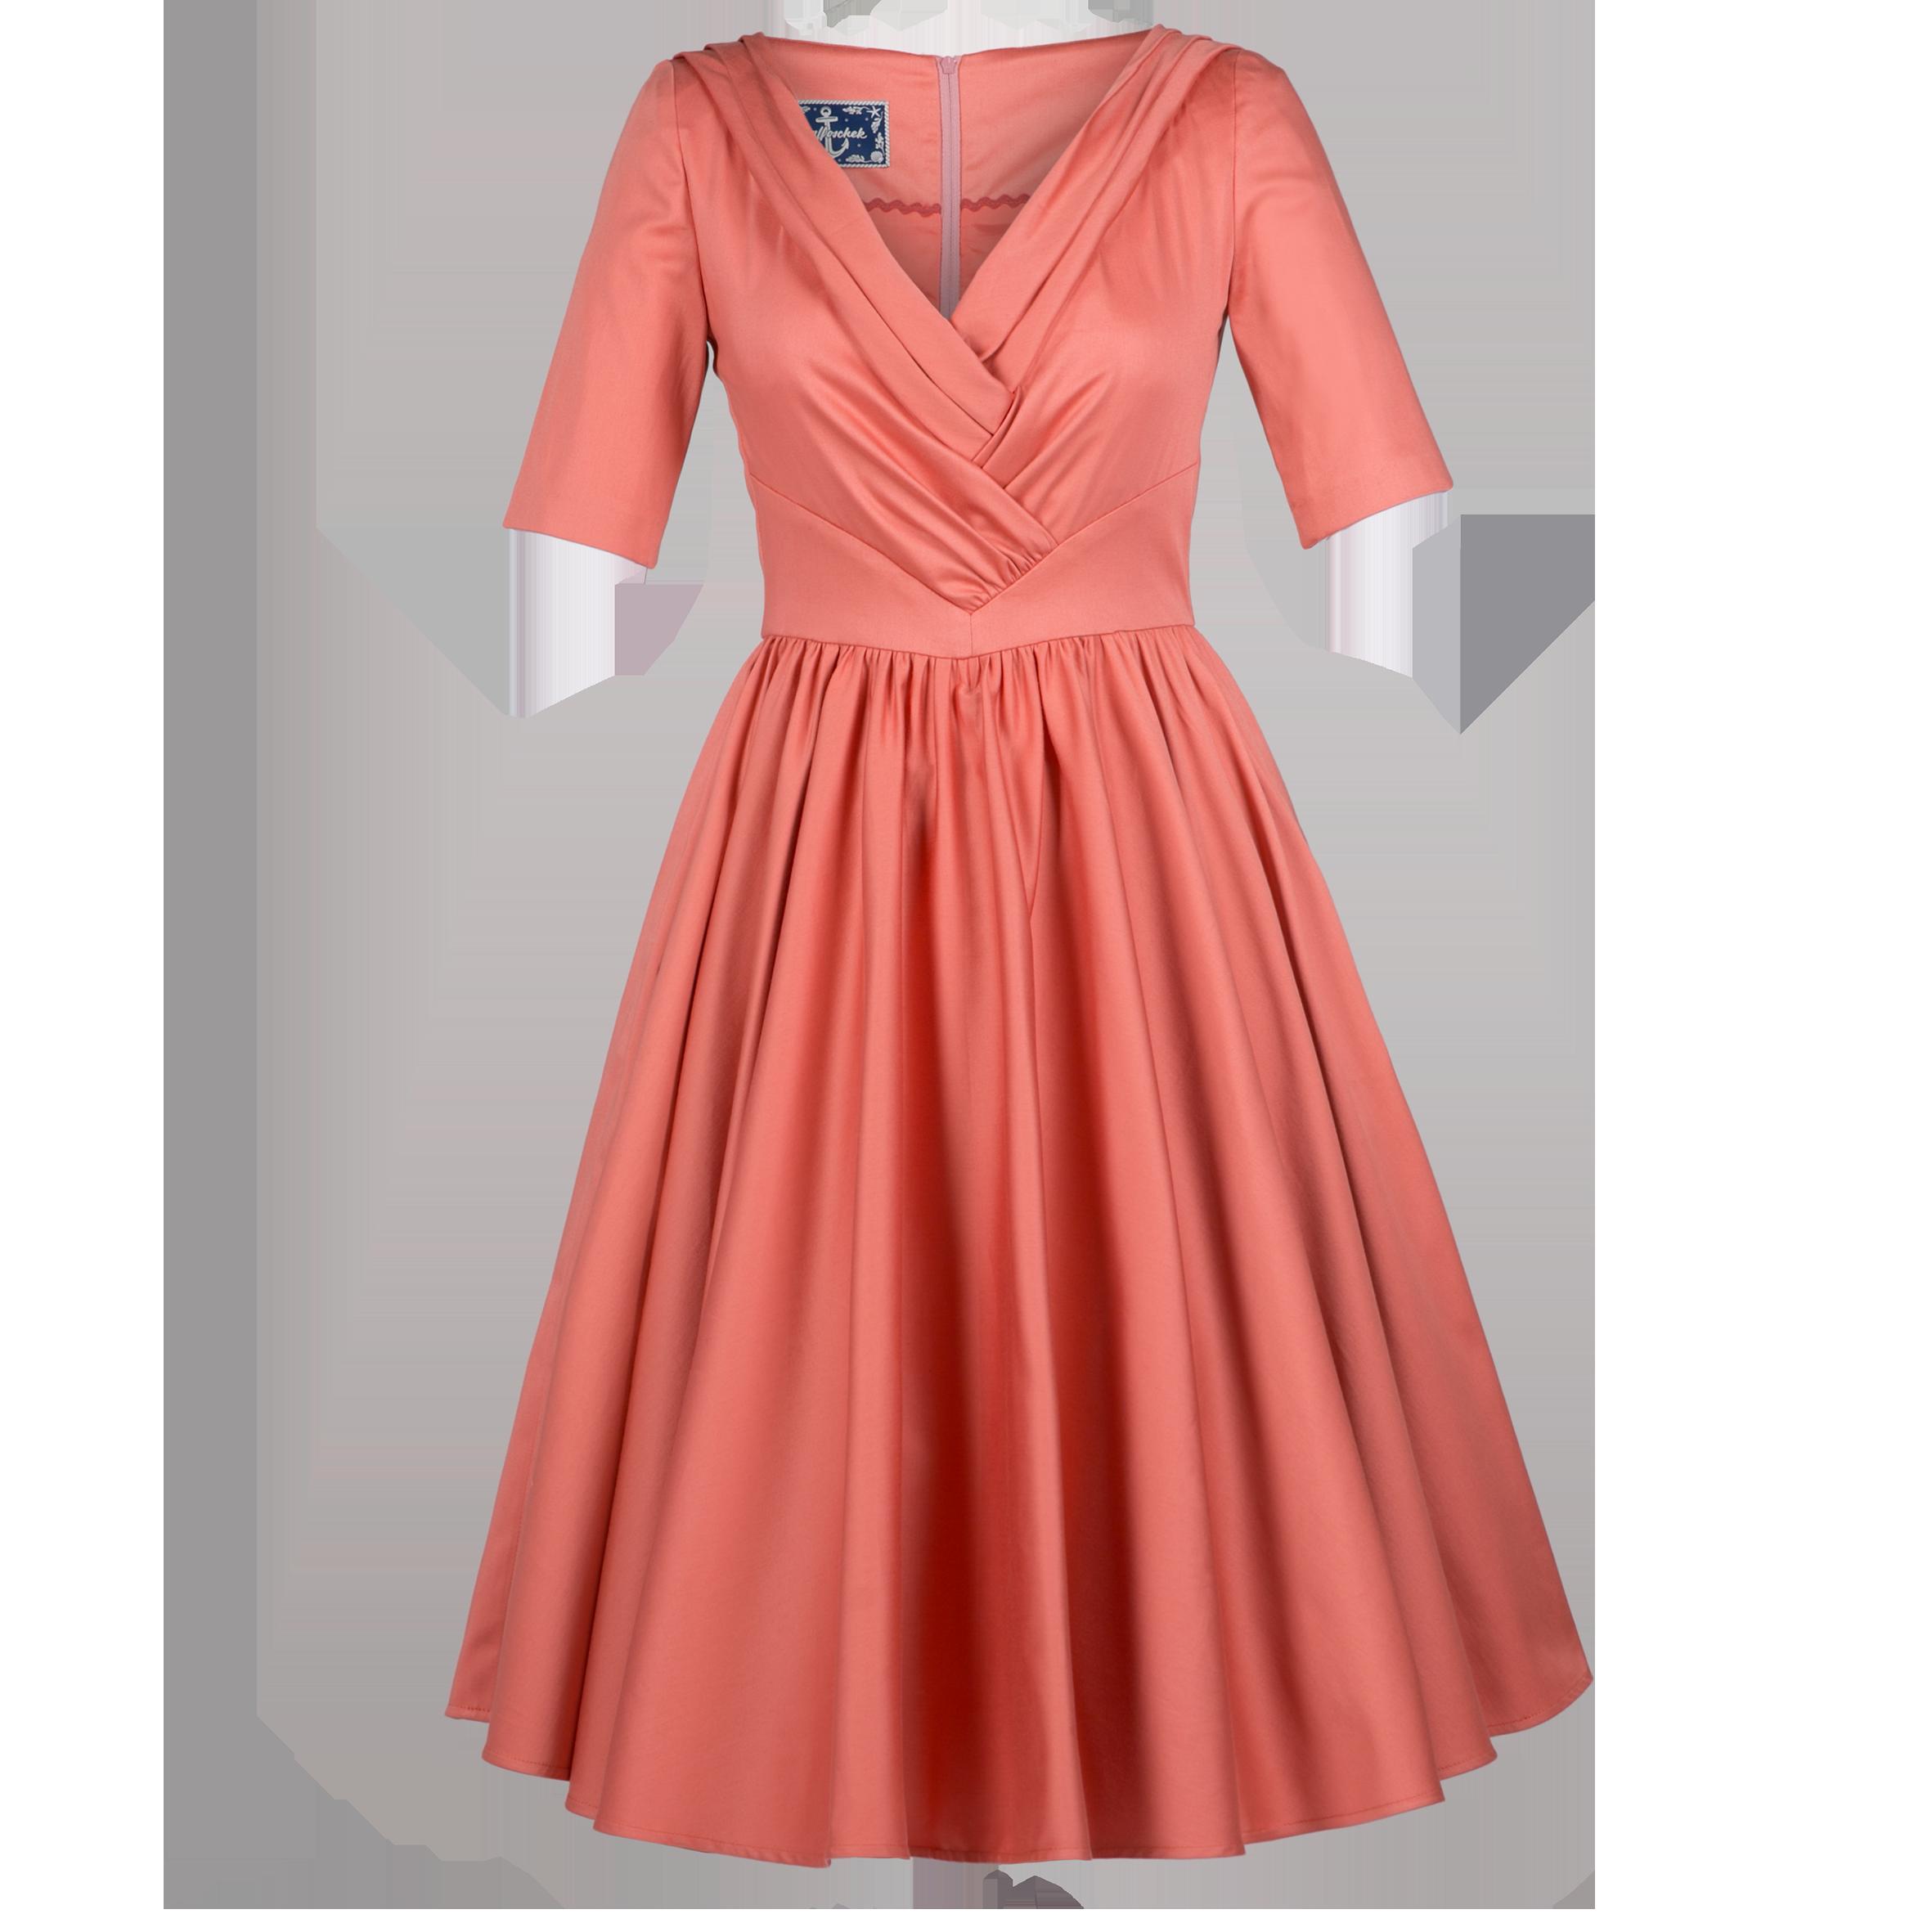 yves dress coral dresses ahoy ss17 online shop lena hoschek online shop ahoy lena. Black Bedroom Furniture Sets. Home Design Ideas